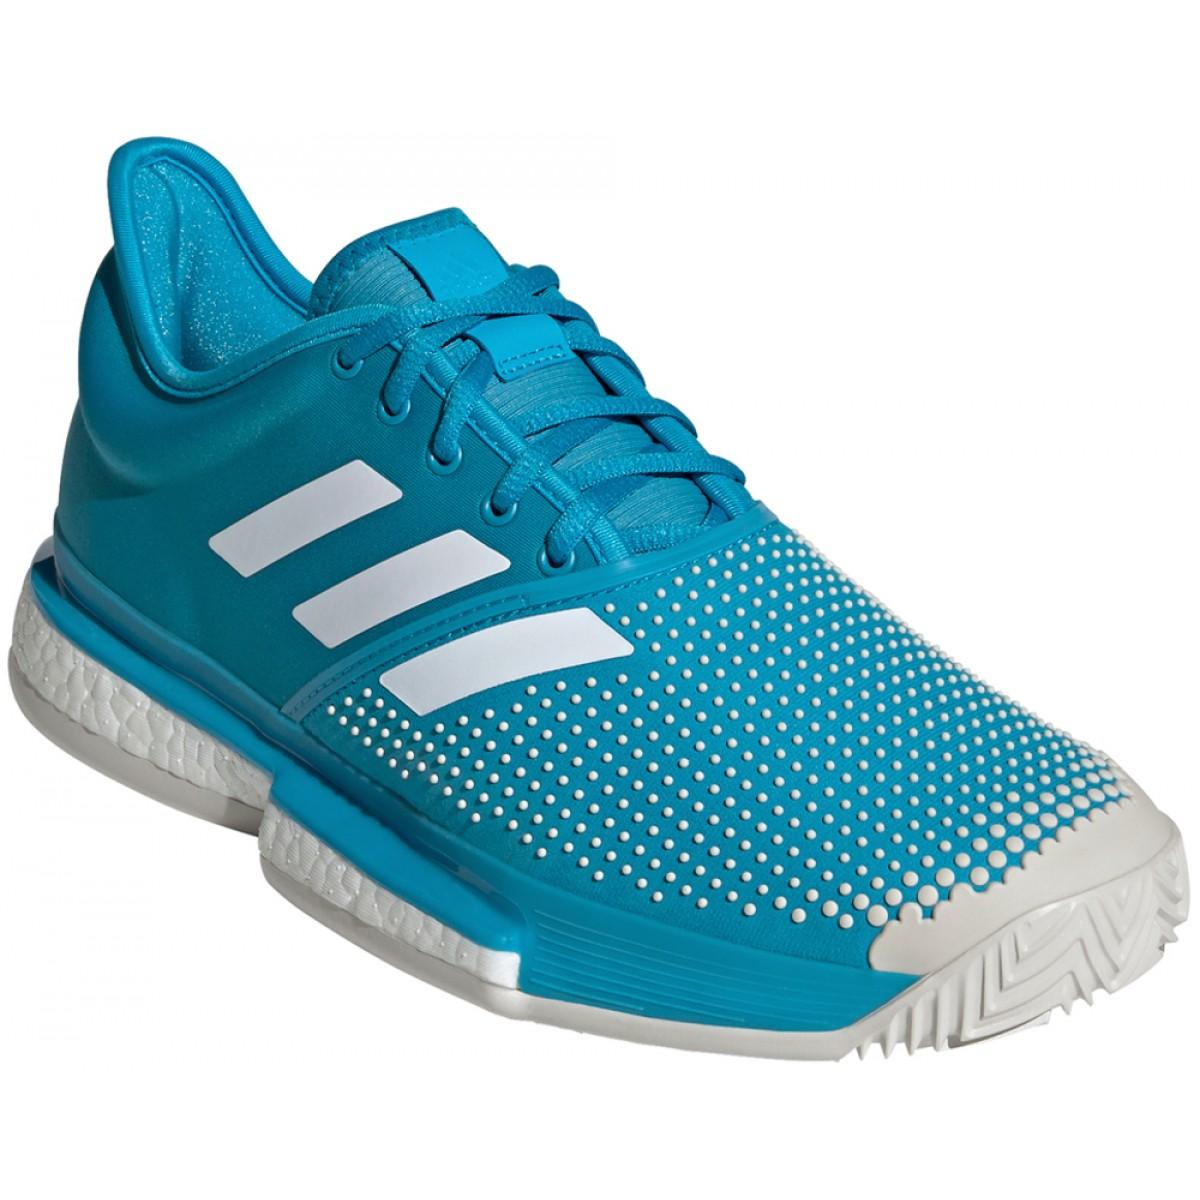 Battue Adidas Boost Solecourt Thiempouille Chaussures Paris Terre fgy6bY7